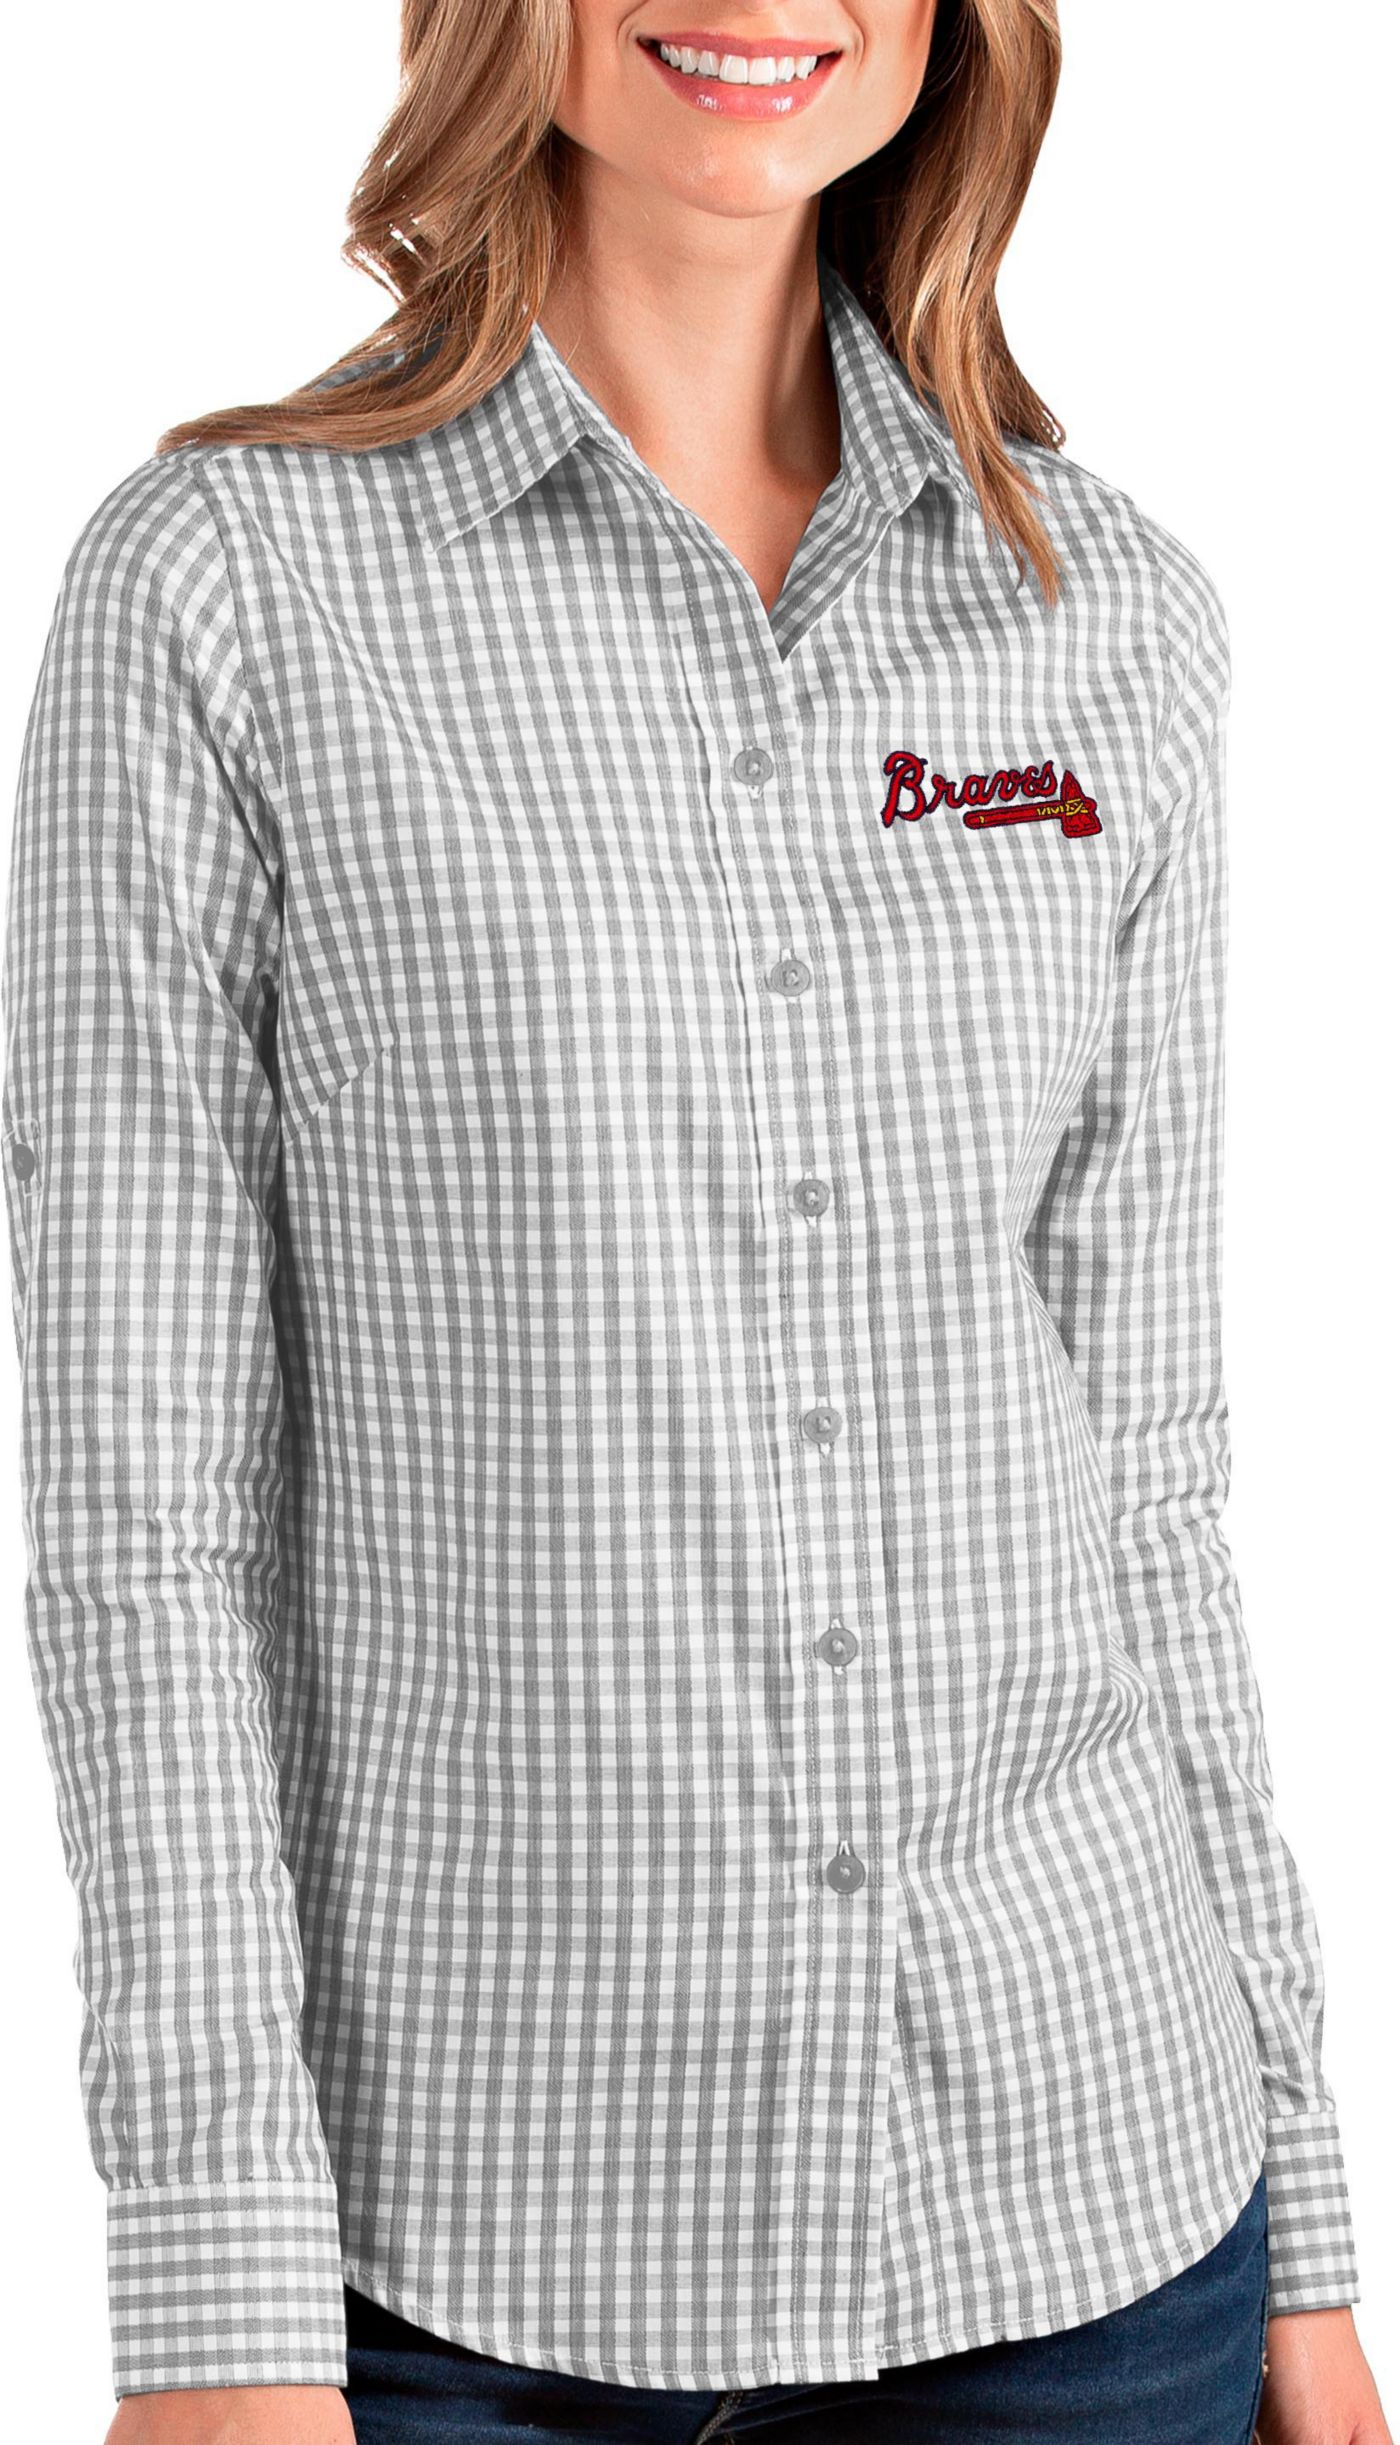 Antigua Women's Atlanta Braves Structure Button-Up Grey Long Sleeve Shirt